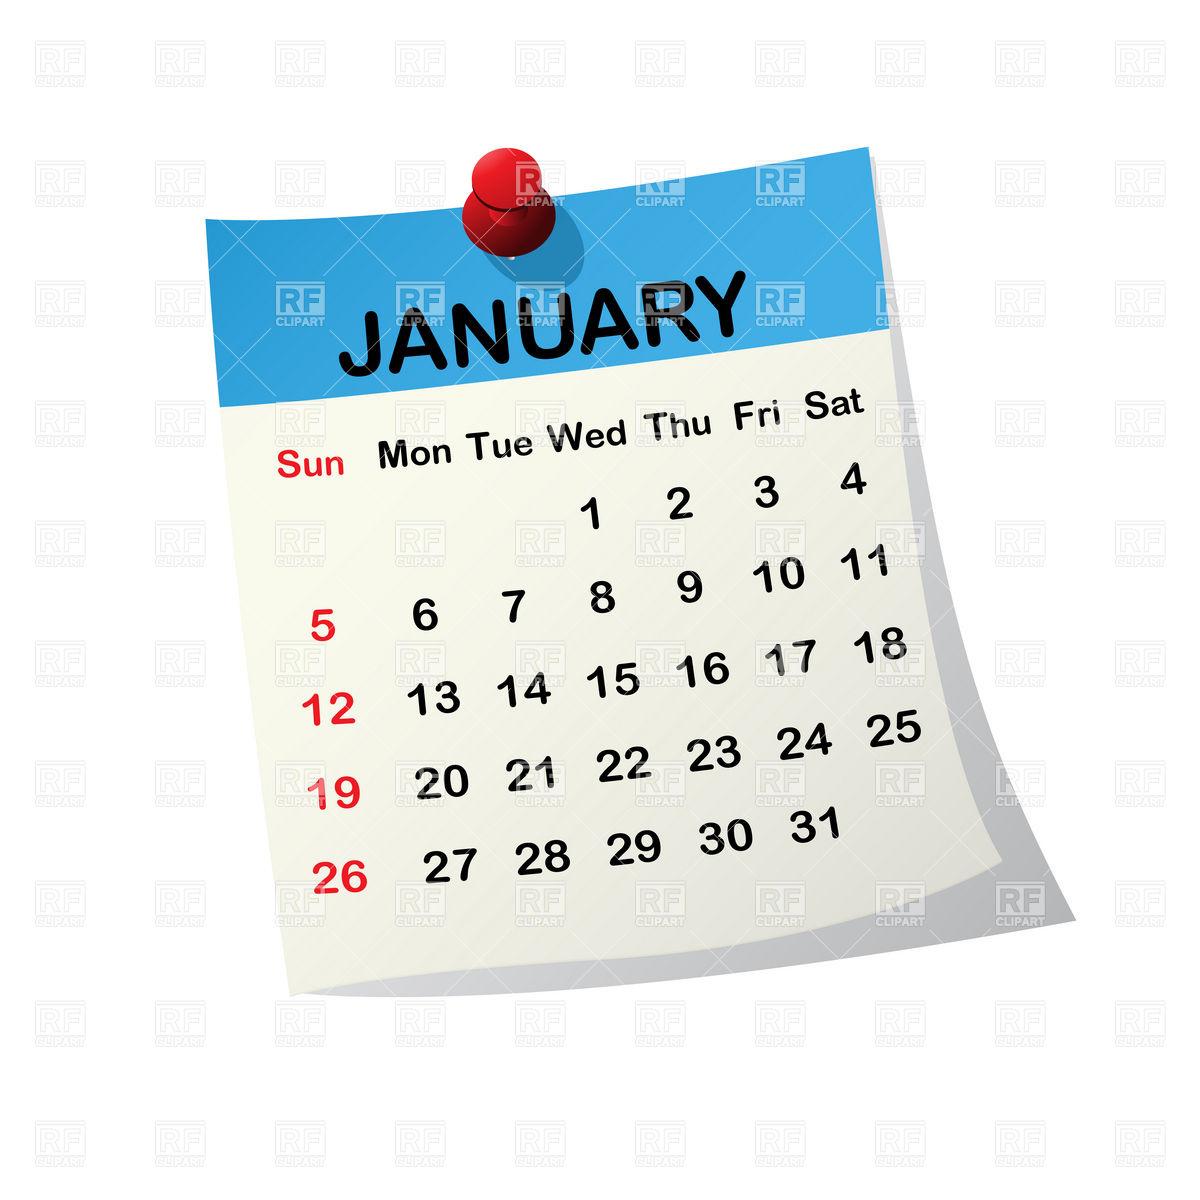 2016 calendar clipart freeuse library 2016 January Calendar Clipart - Clipart Kid freeuse library